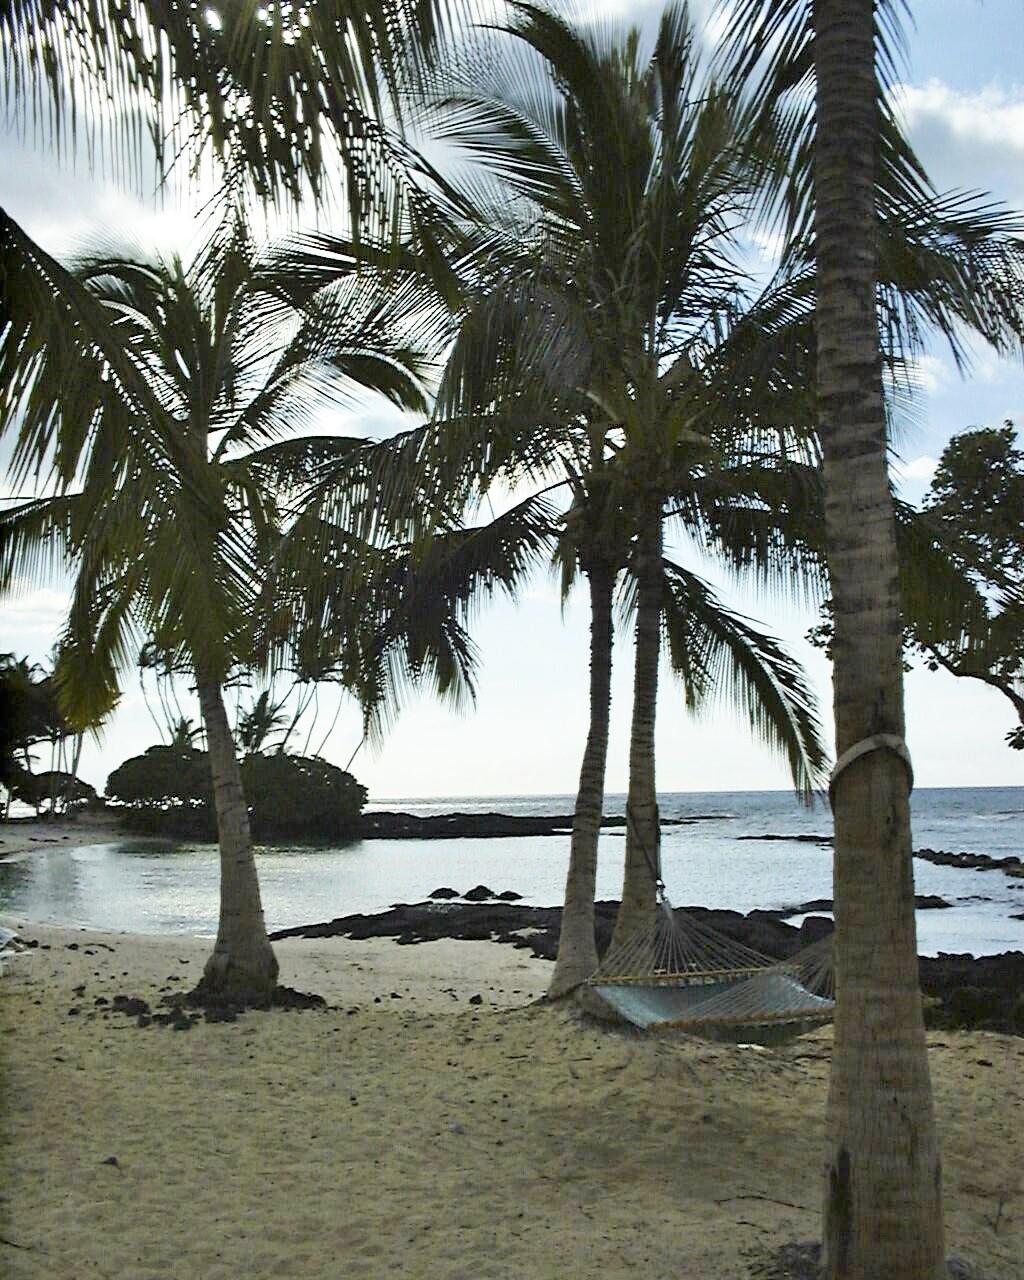 beach, palm trees, hammock